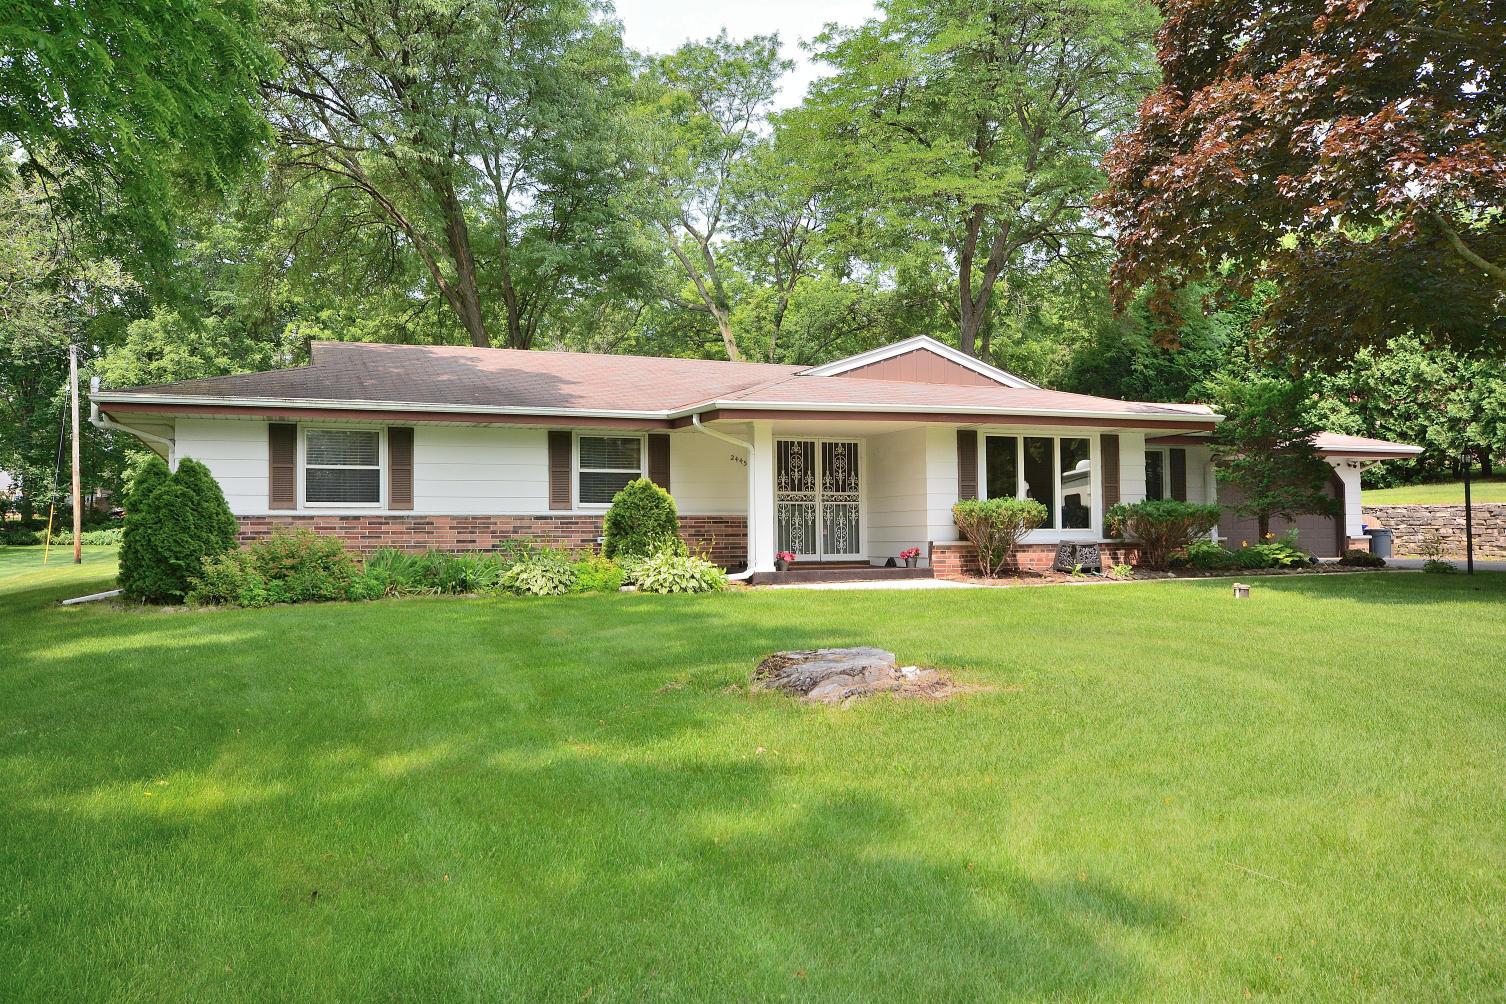 2445 Rockway Ln E, Brookfield, Wisconsin 53005, 3 Bedrooms Bedrooms, 8 Rooms Rooms,2 BathroomsBathrooms,Single-Family,For Sale,Rockway Ln E,1647142